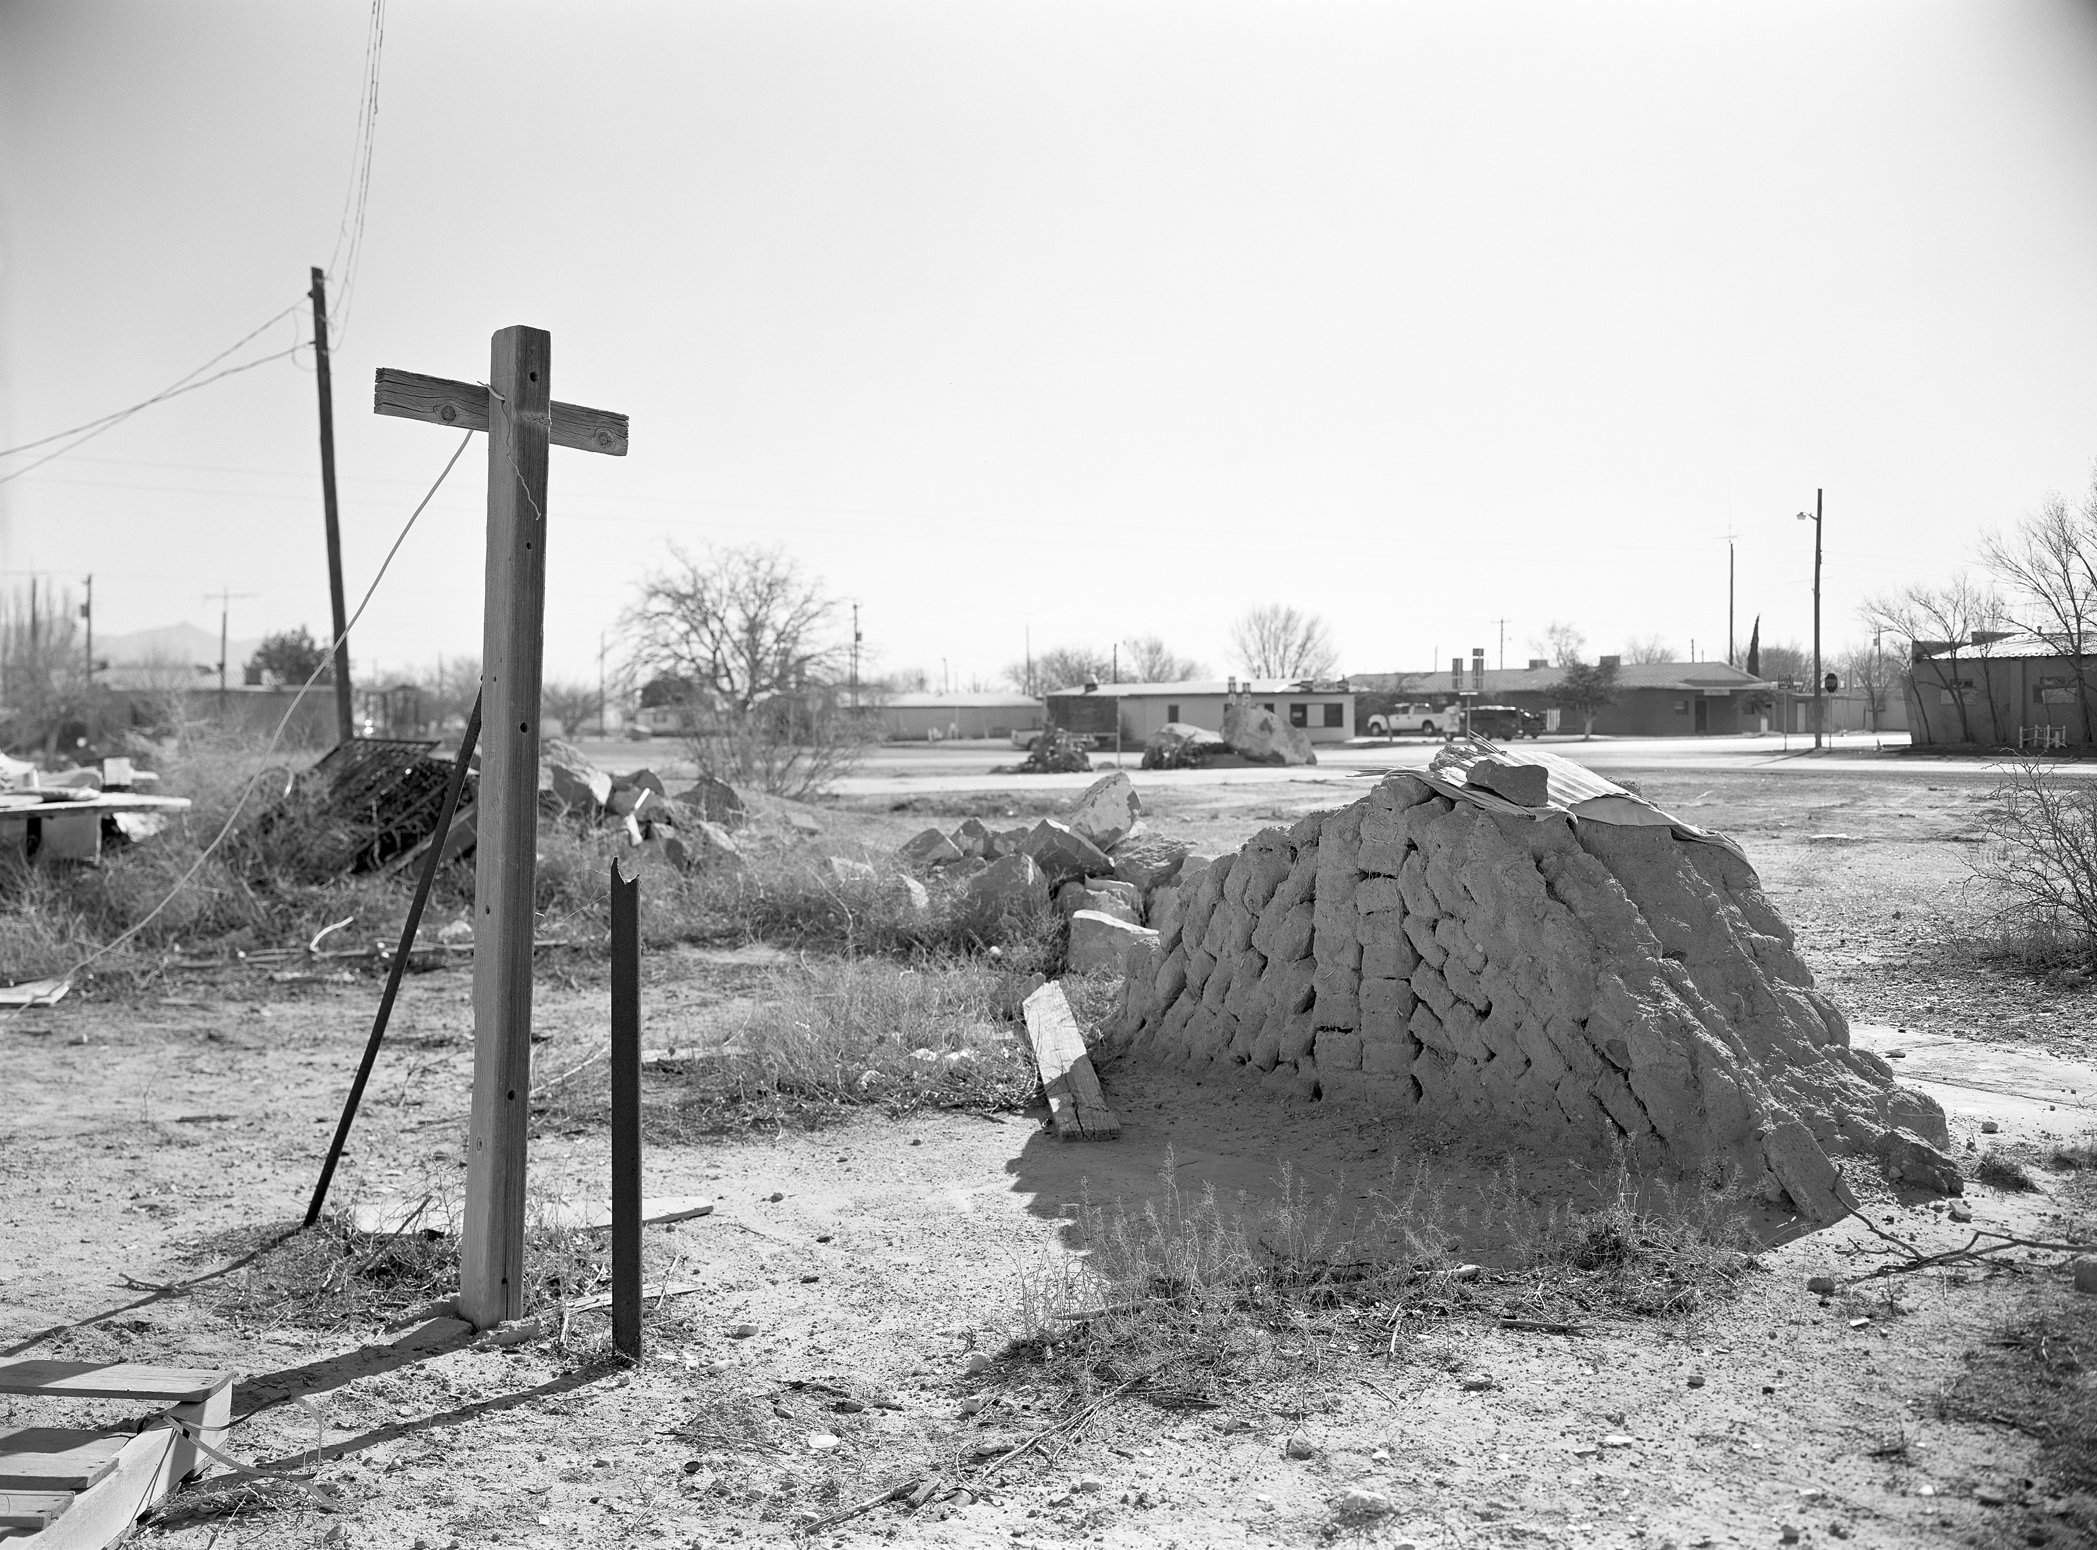 Dell City, Texas 2002